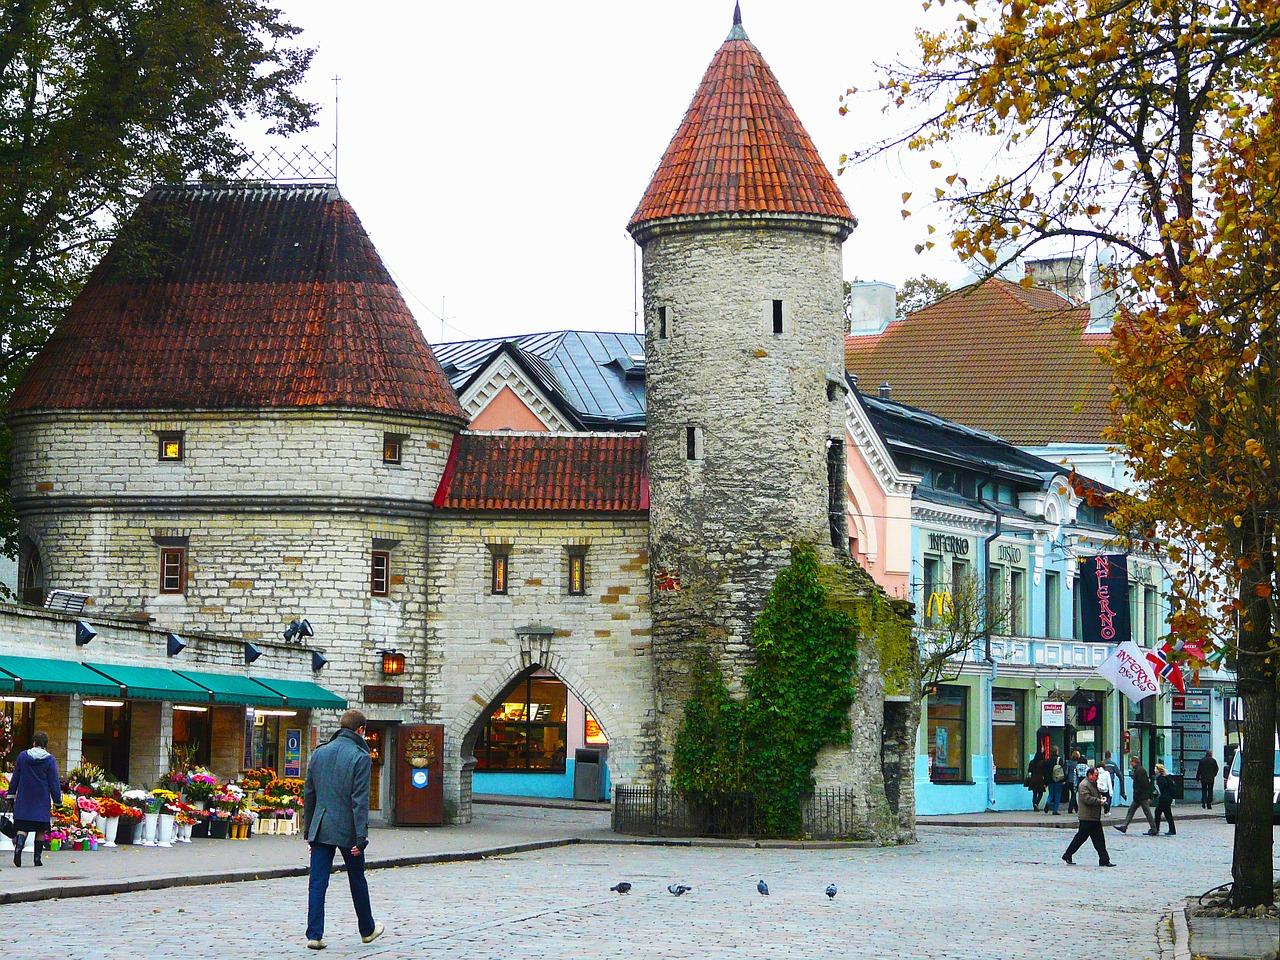 Estland, Tallinn, Urlaub, Reise